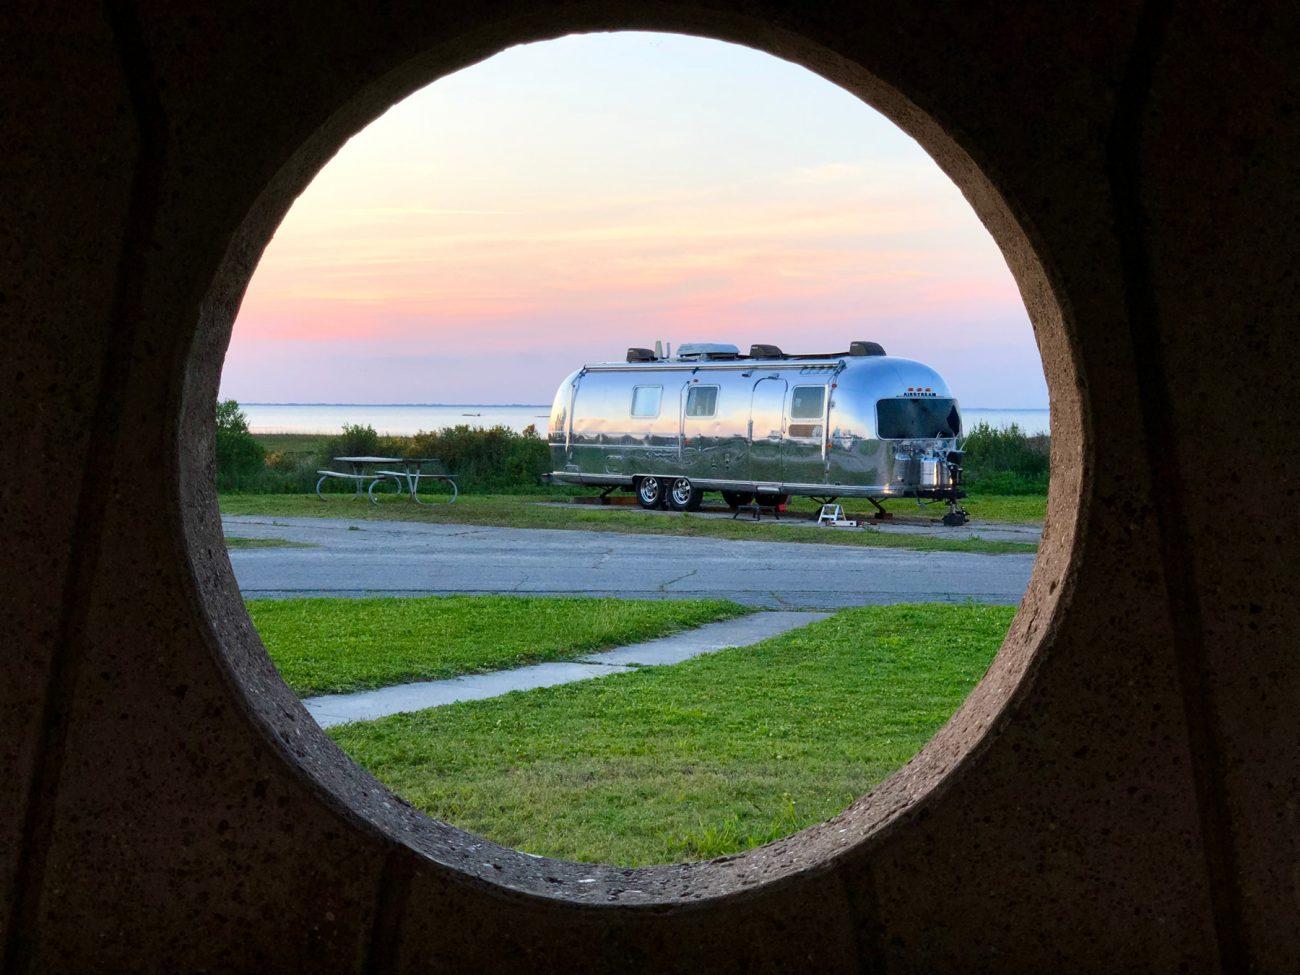 Airstream near cost at Galveston framed by circle